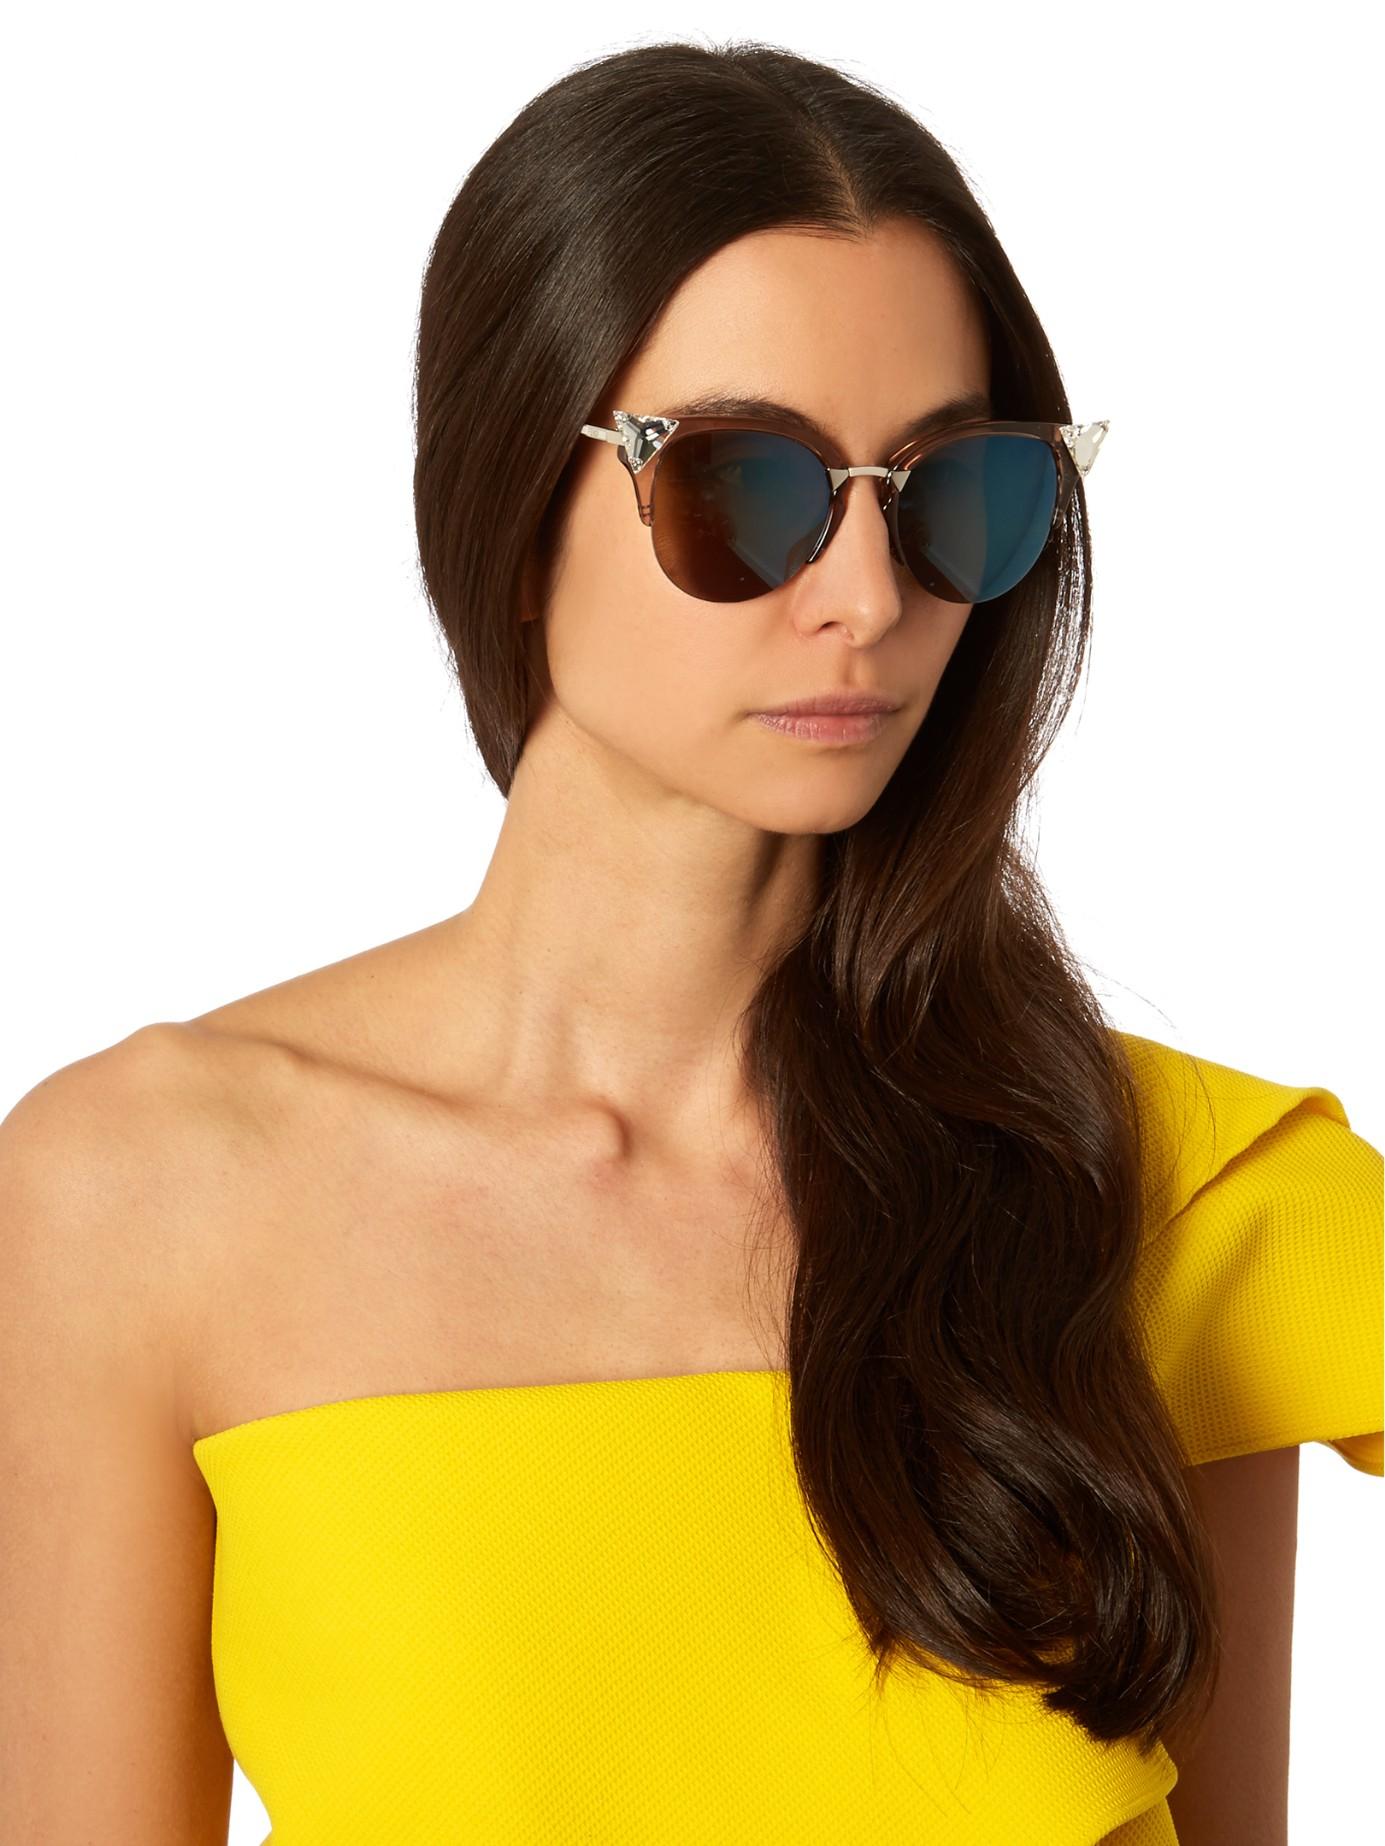 Cat Fendi Frame Eye Pink Half Sunglasses rdtCsQh